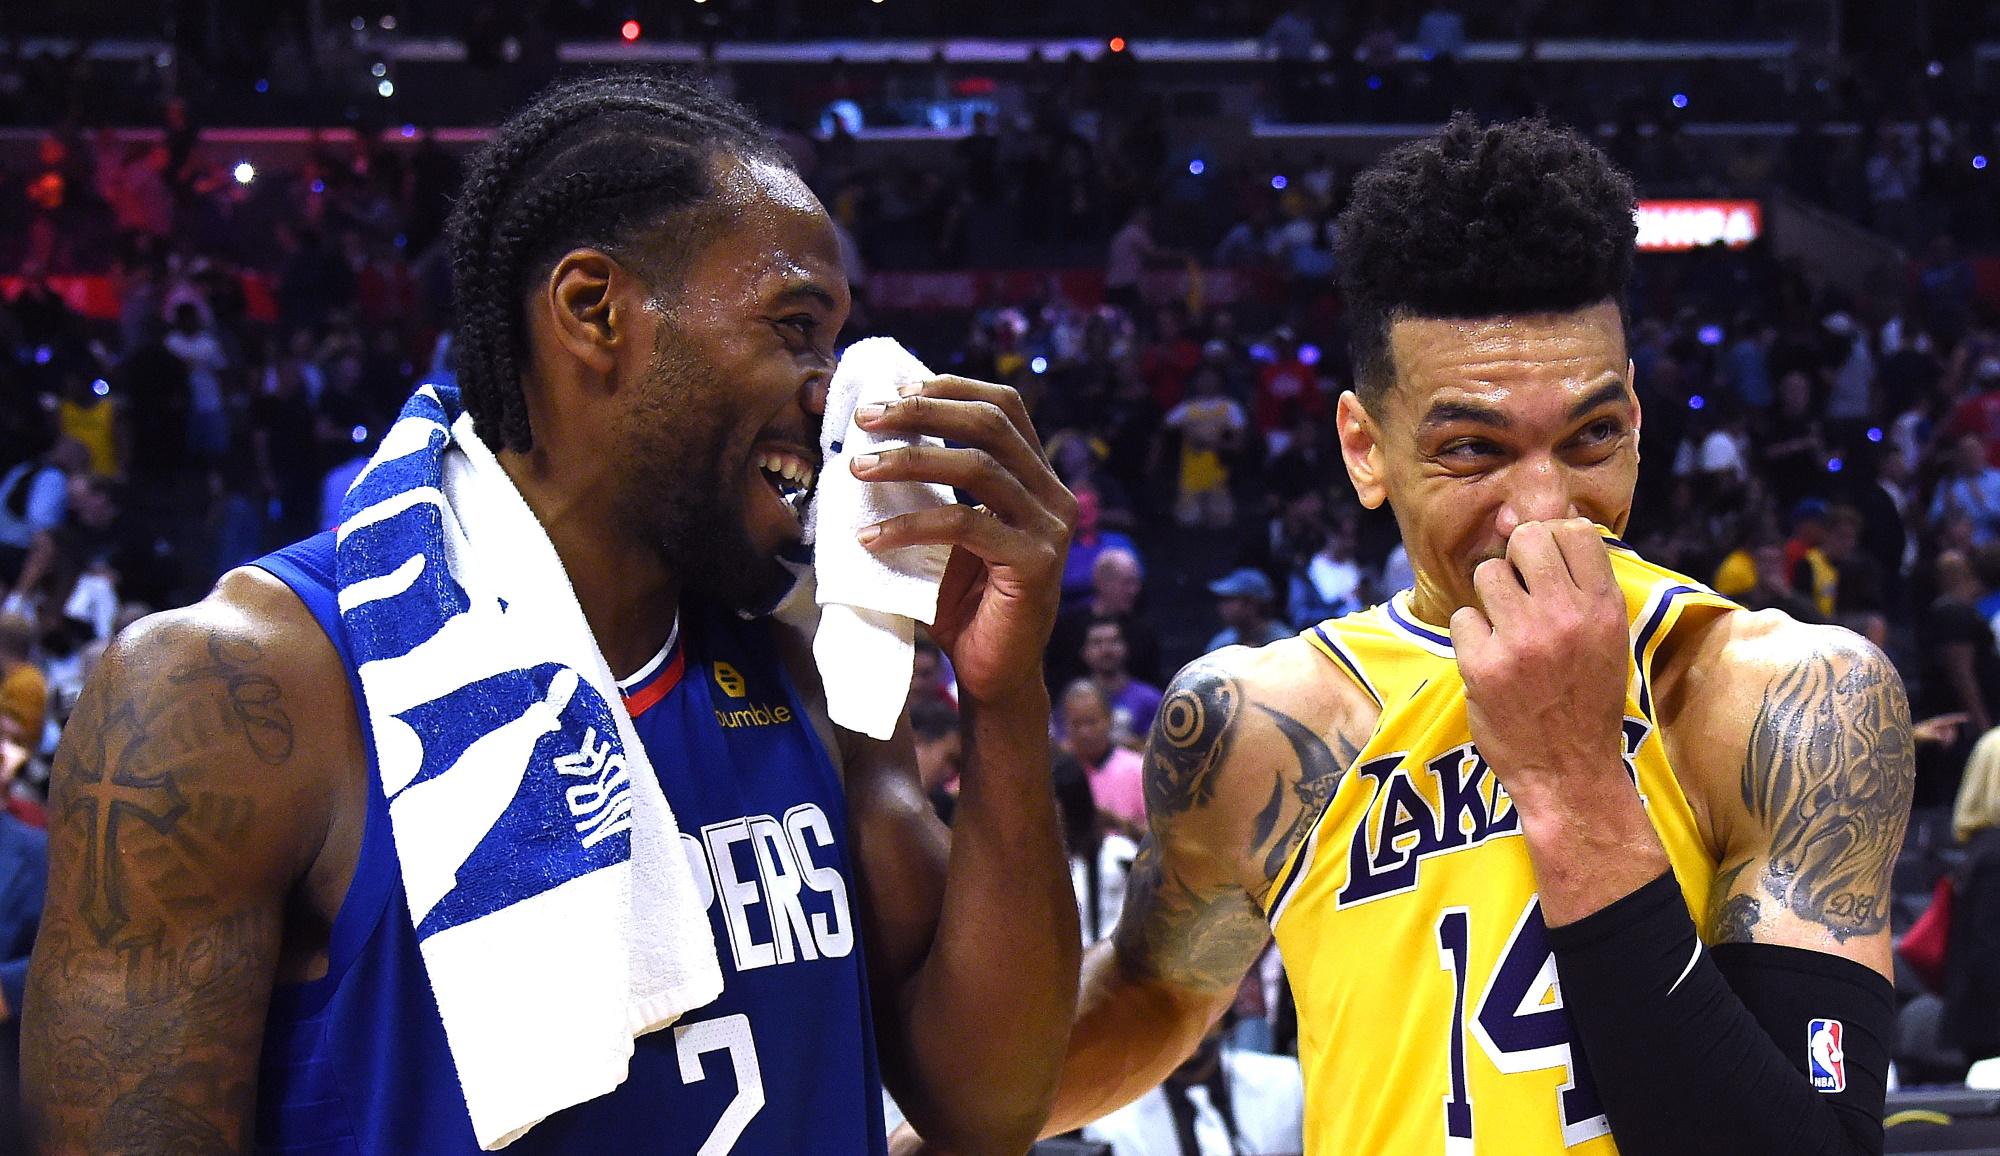 Kawhi Leonard and Danny Green, Los Angeles Lakers vs L.A. Clippers